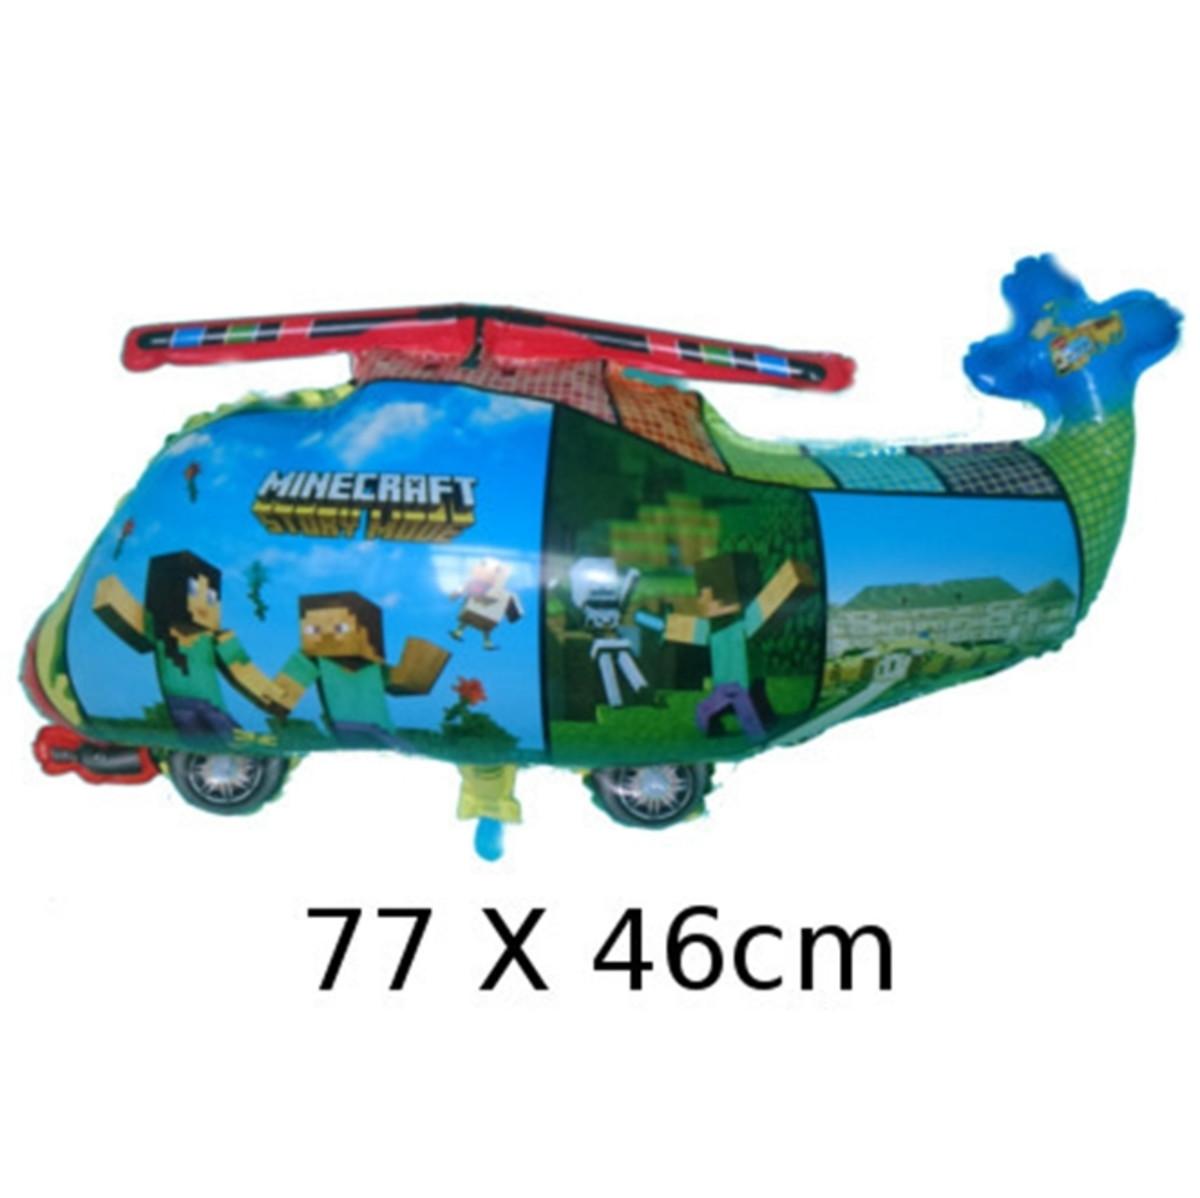 Balão Metalizado Helicóptero Minecraft 77*46cm